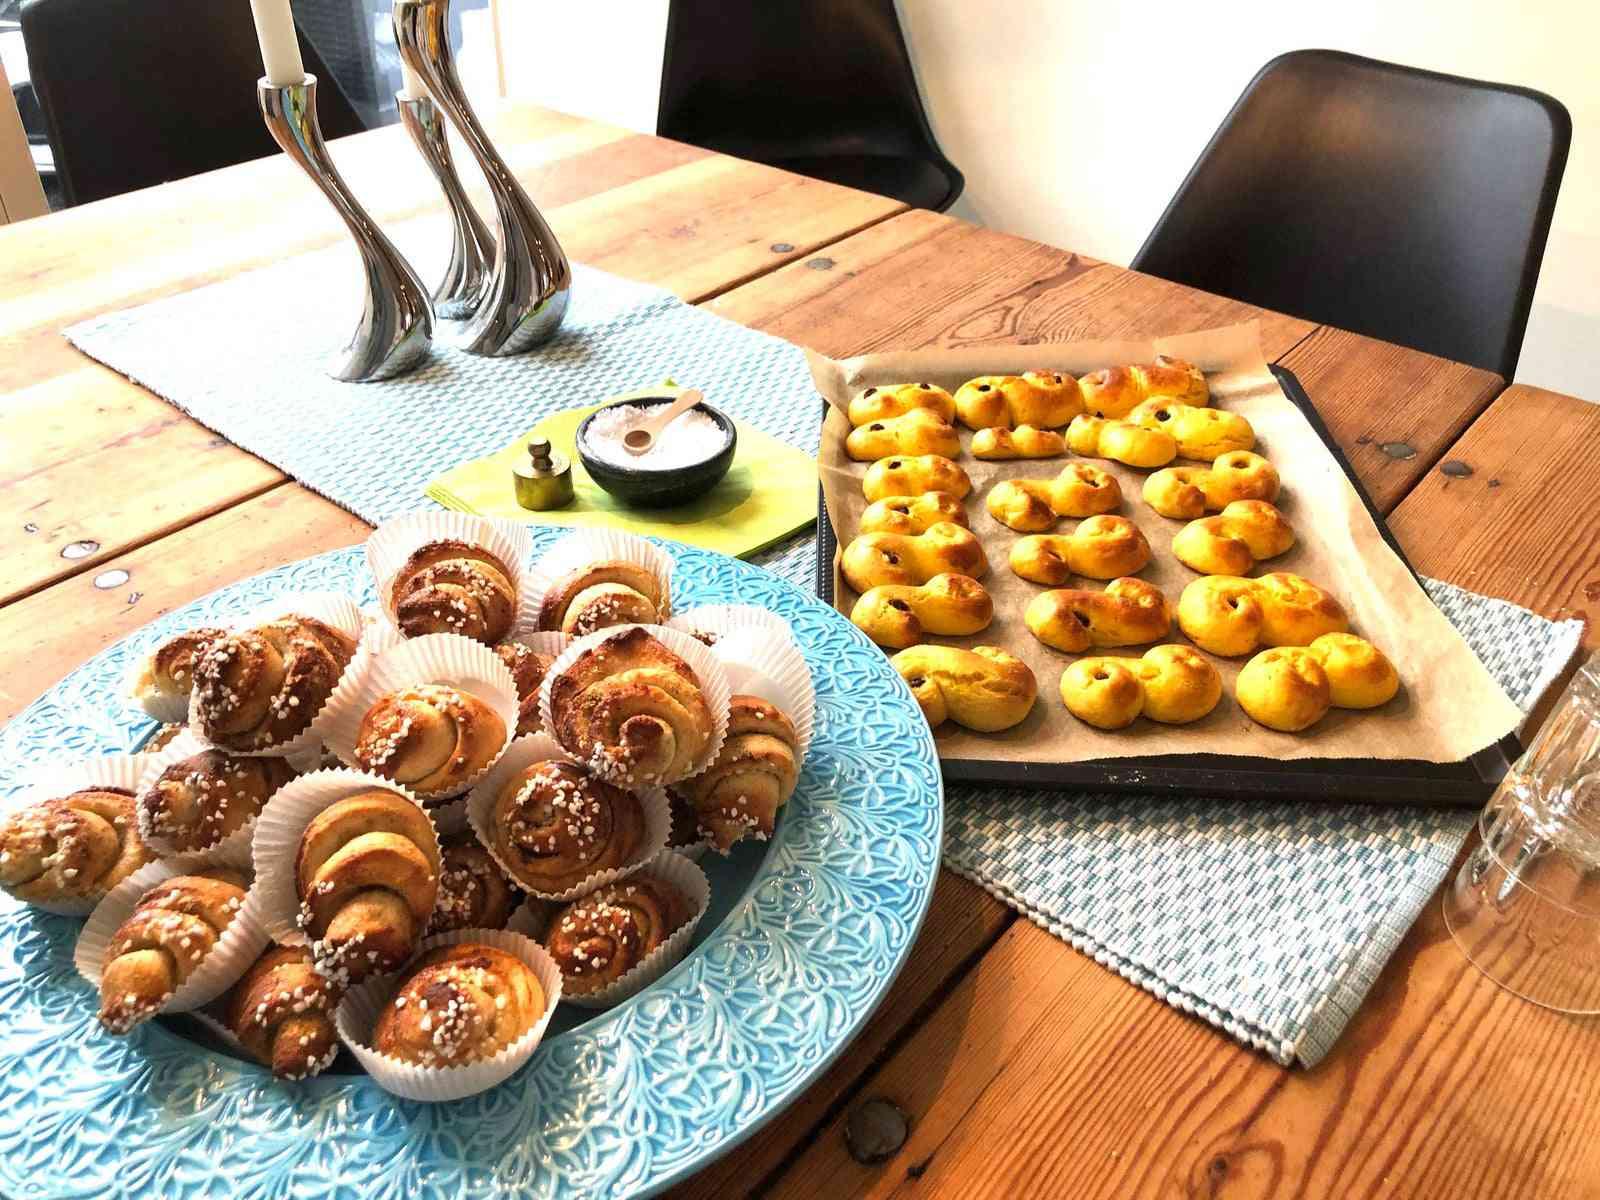 Swedish pastries